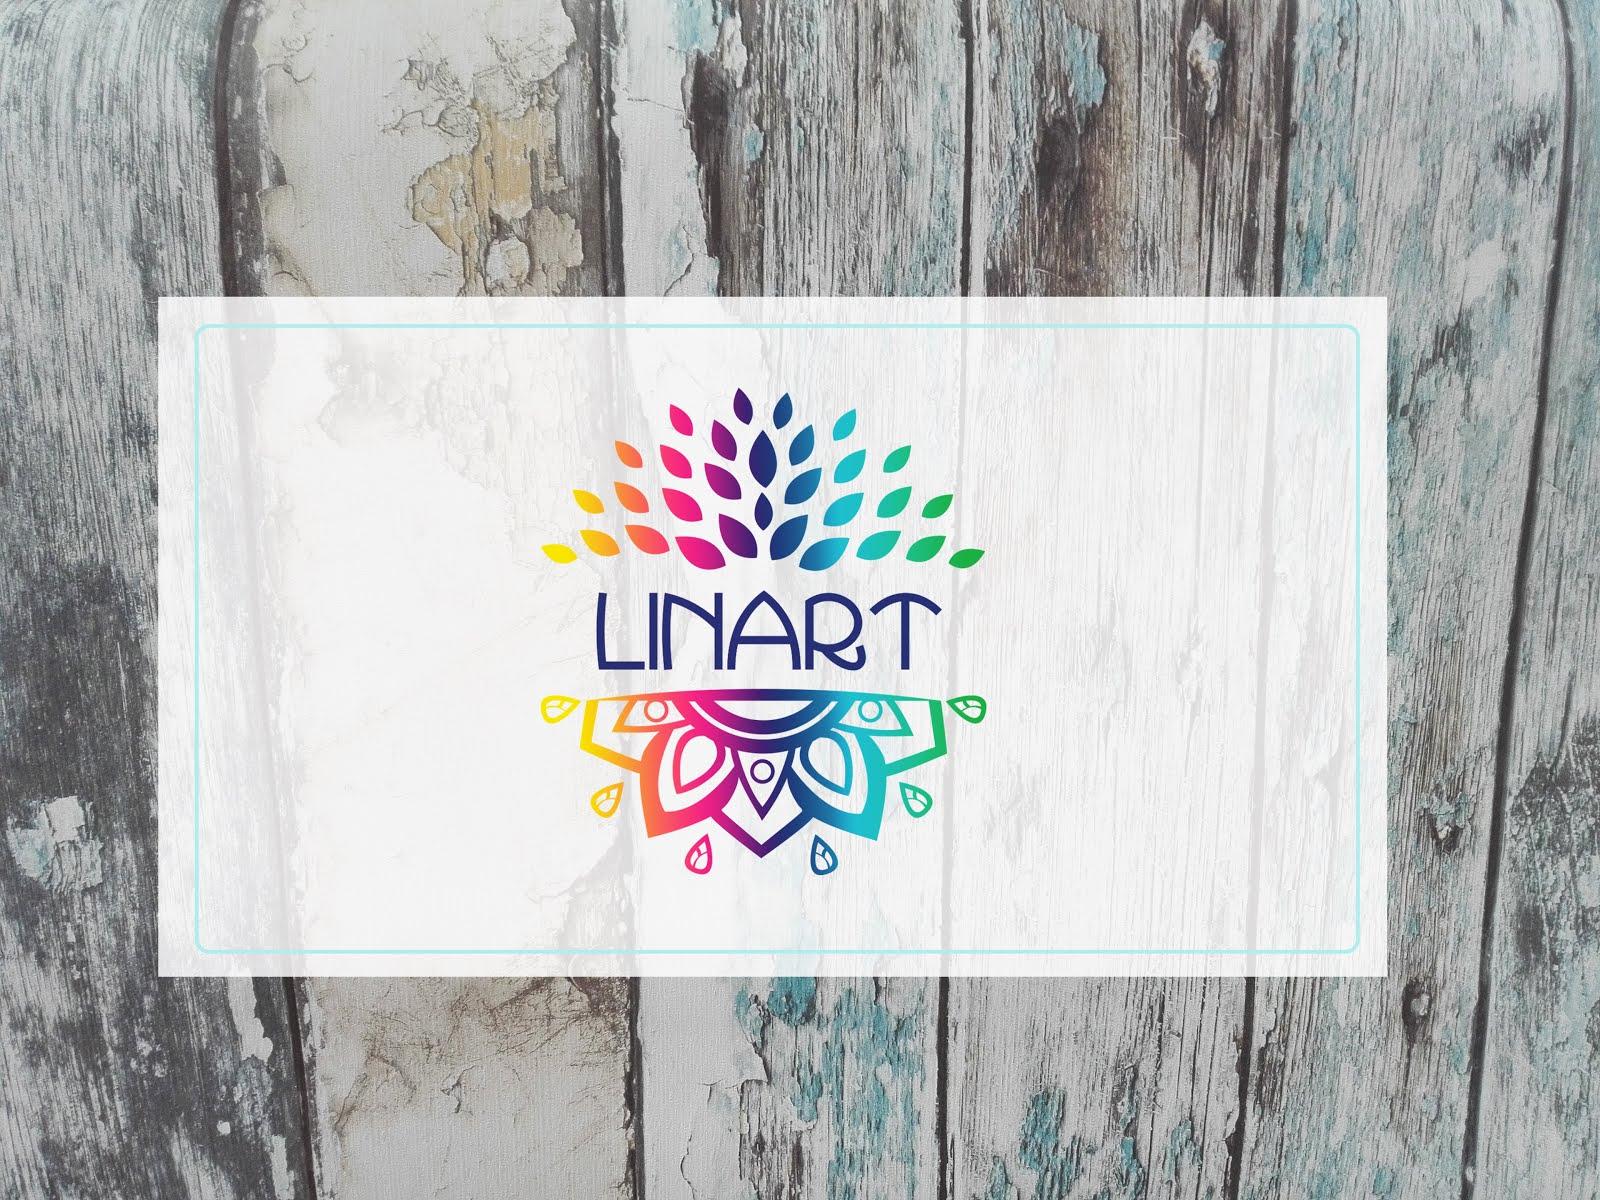 LinArt